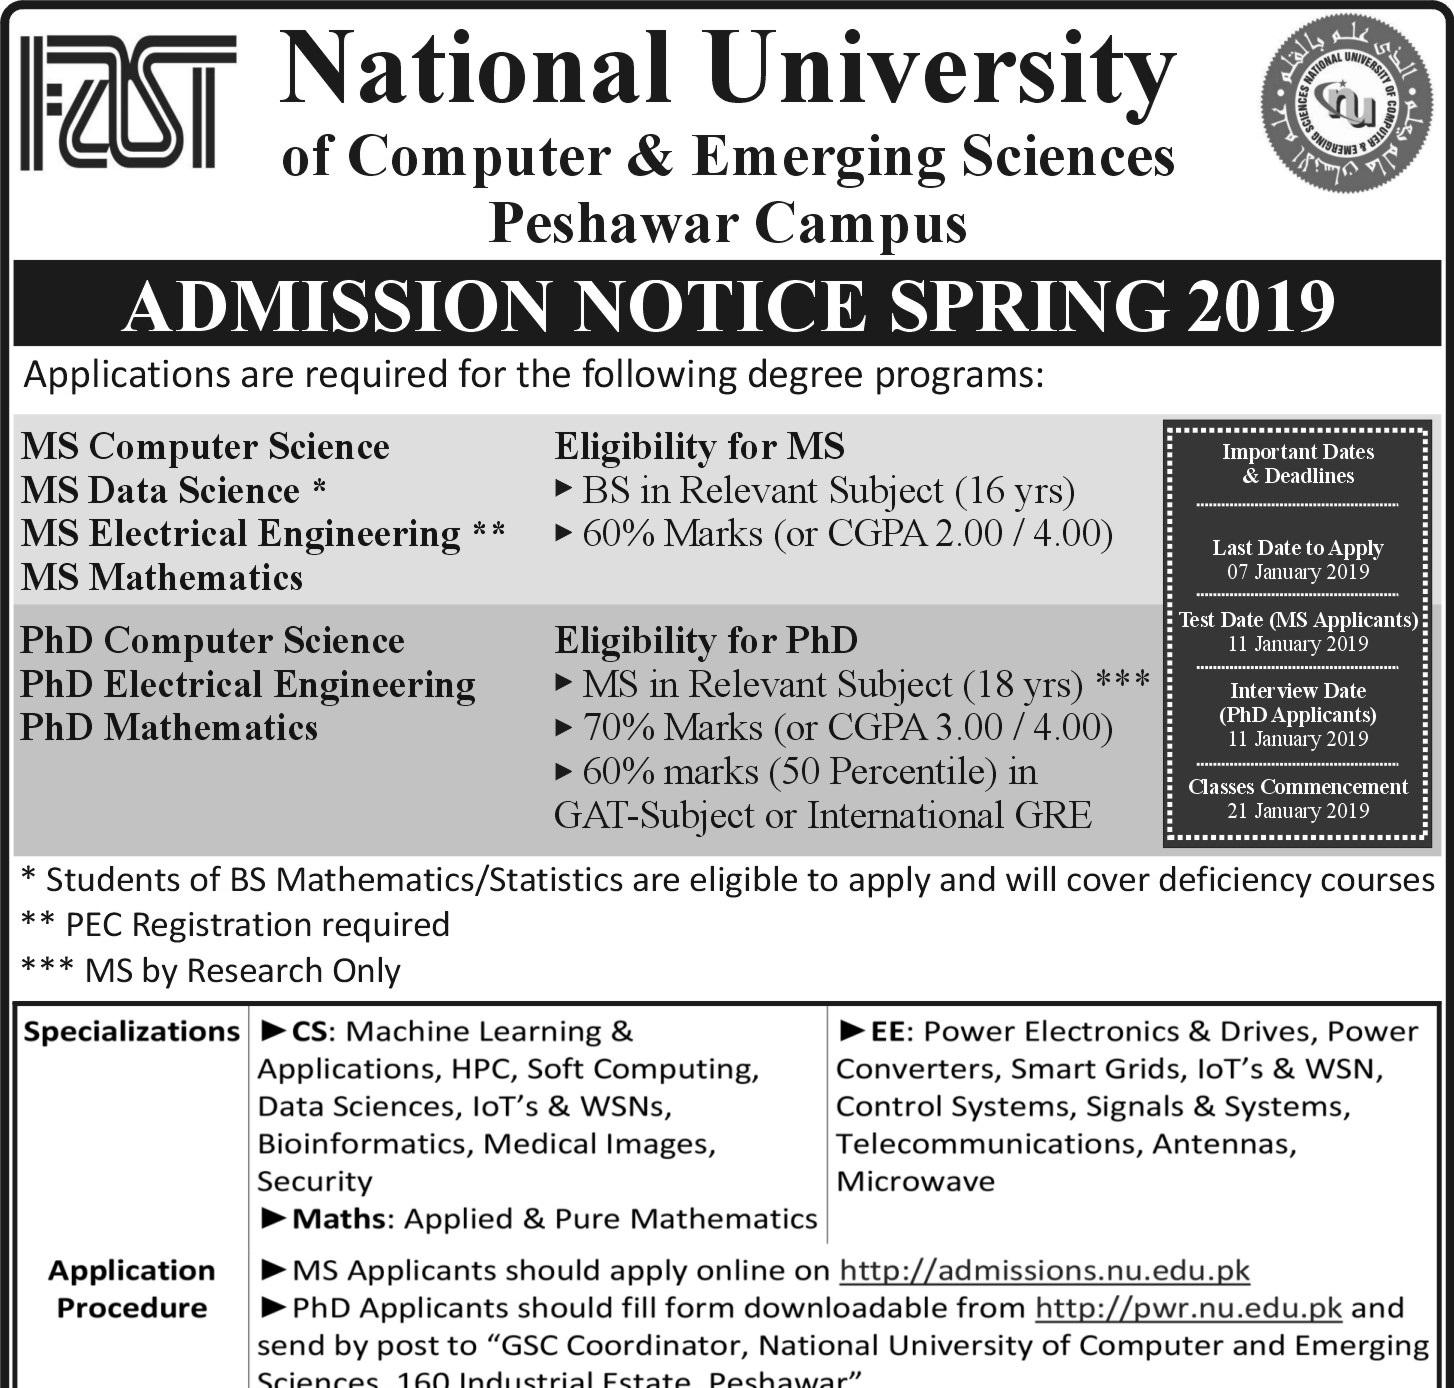 Fast University Islamabad Admission Advertisement 2019